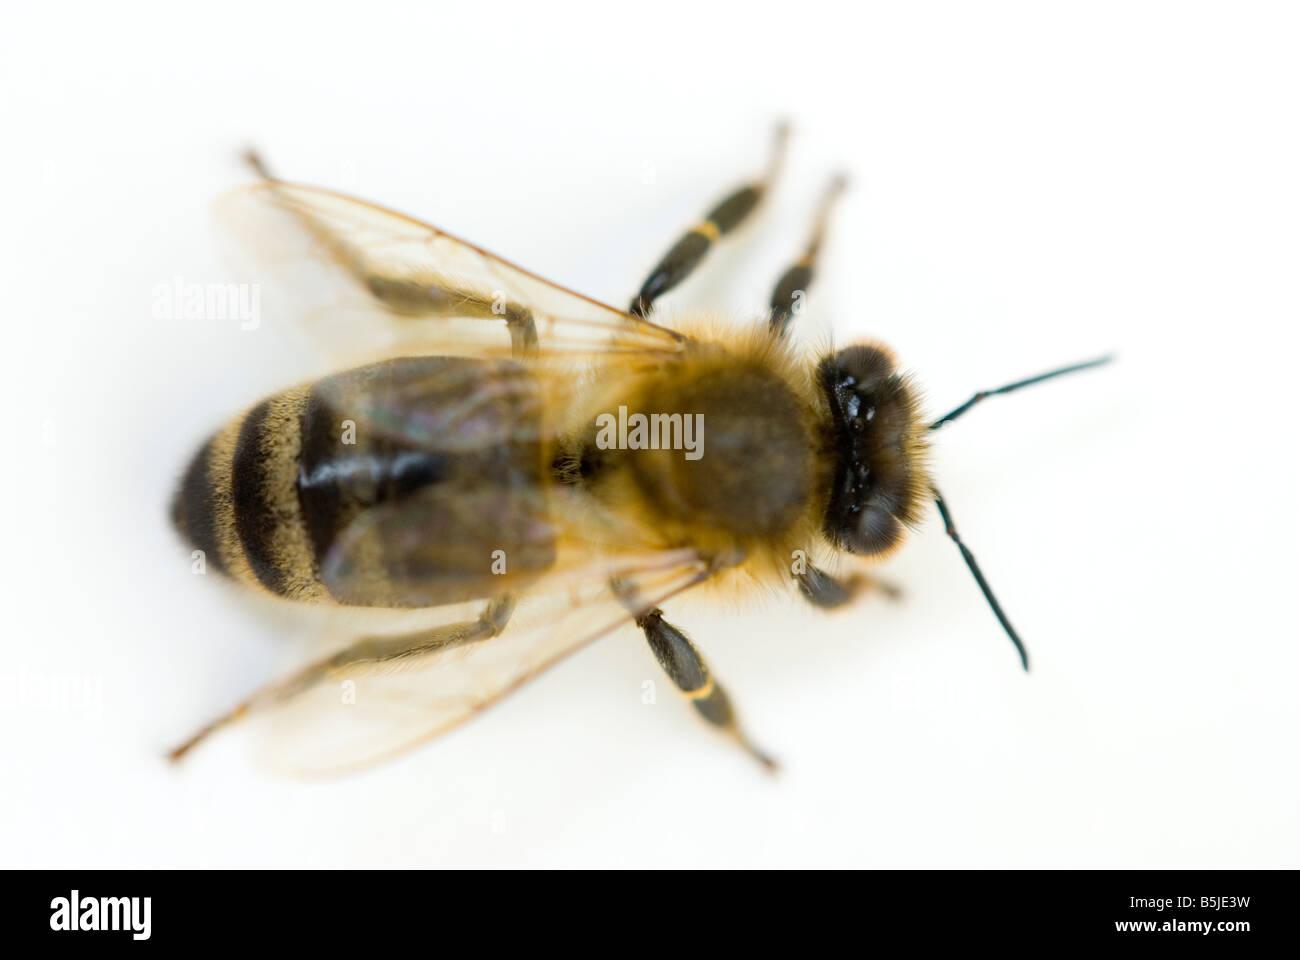 Honeybee Apis mellifera - Stock Image